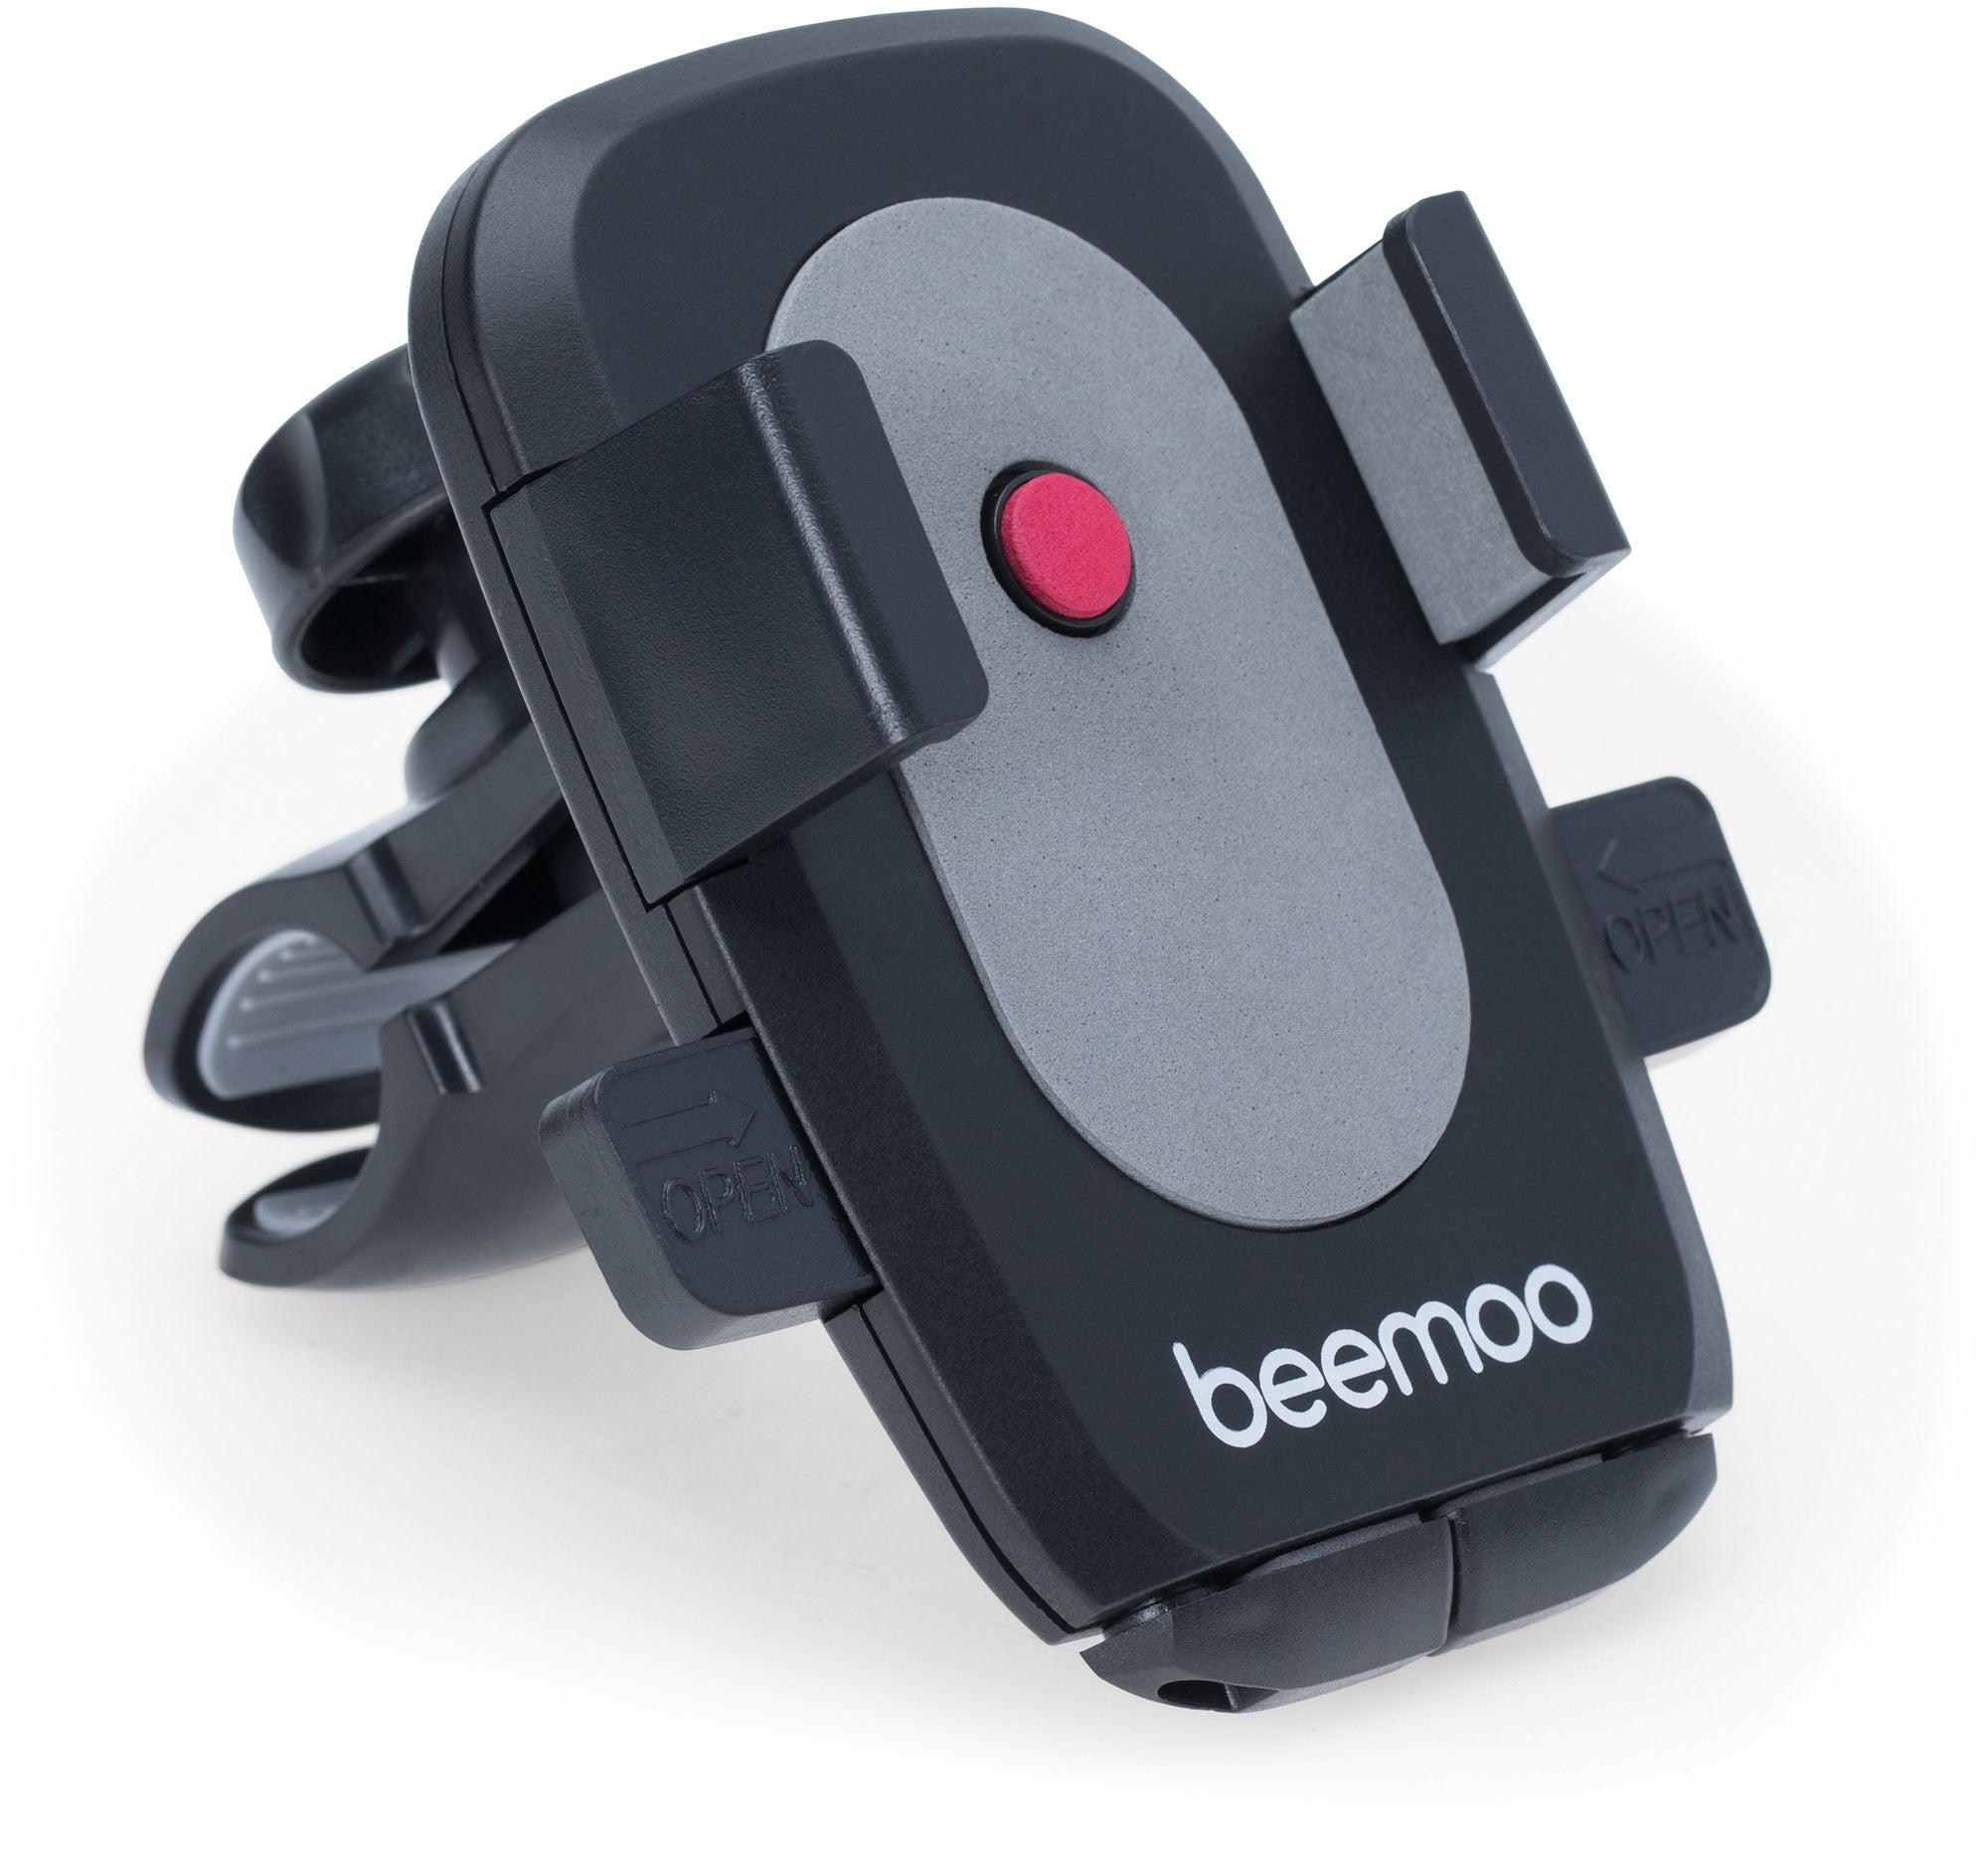 Beemoo Puhelinpidike, Black